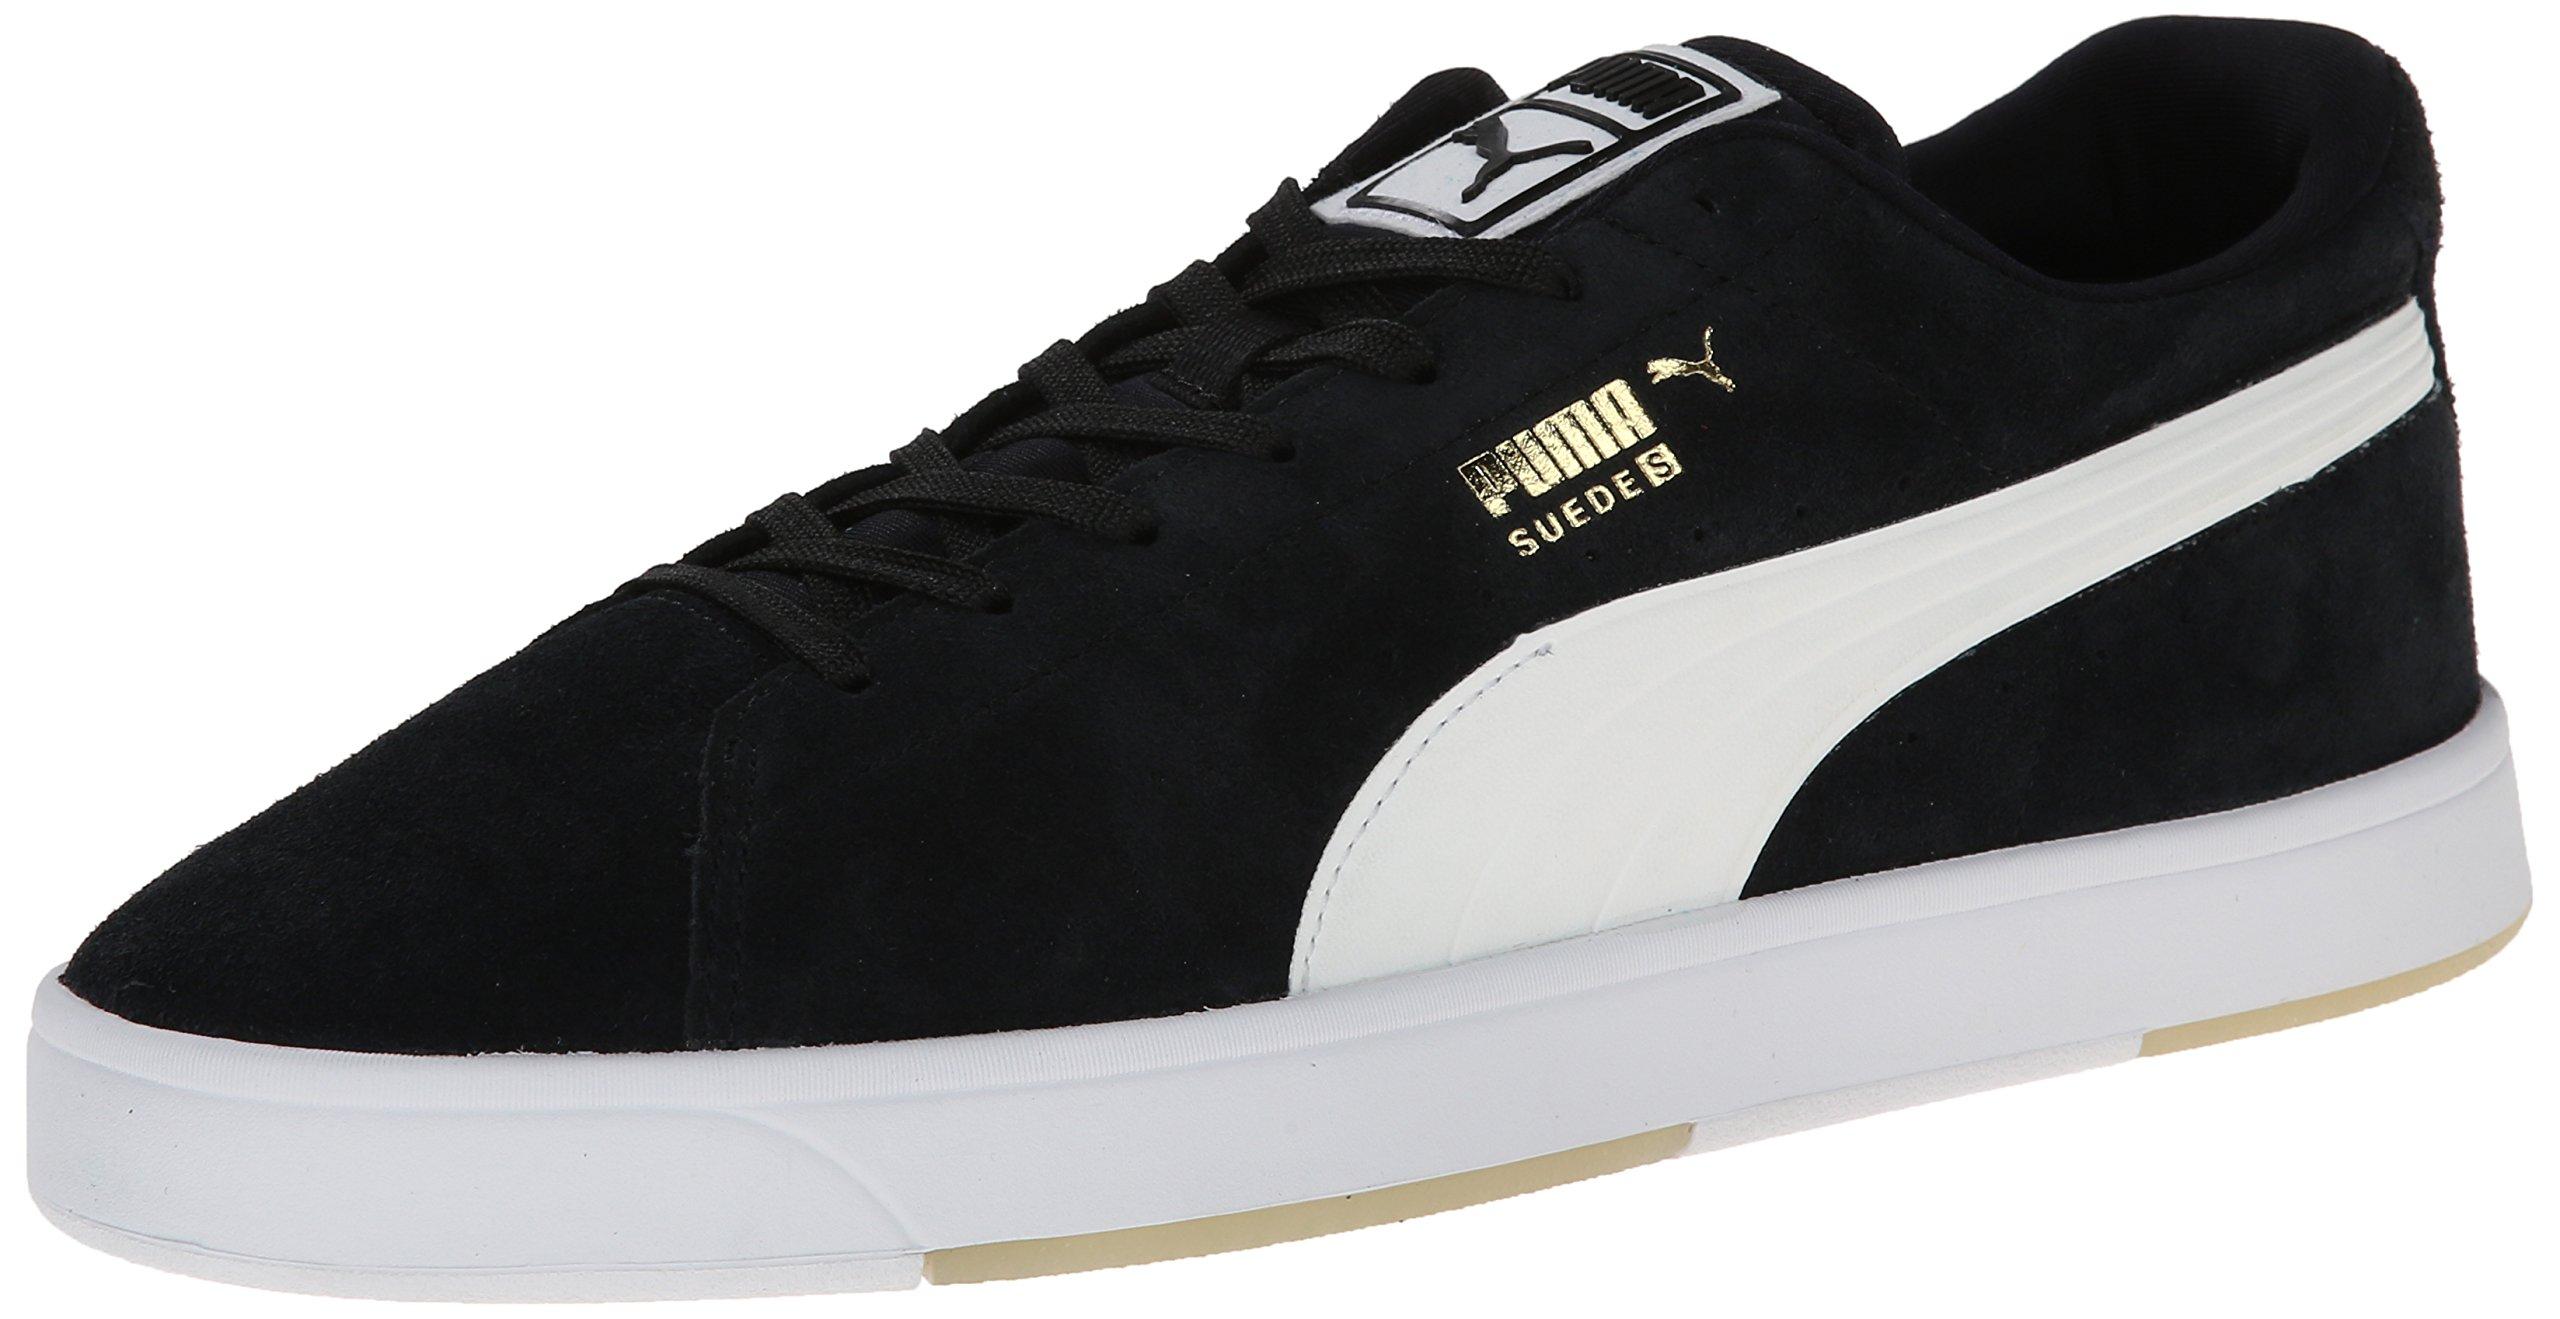 PUMA Men's Suede S Lace-Up Fashion Sneaker, Black/White, 10.5 M US